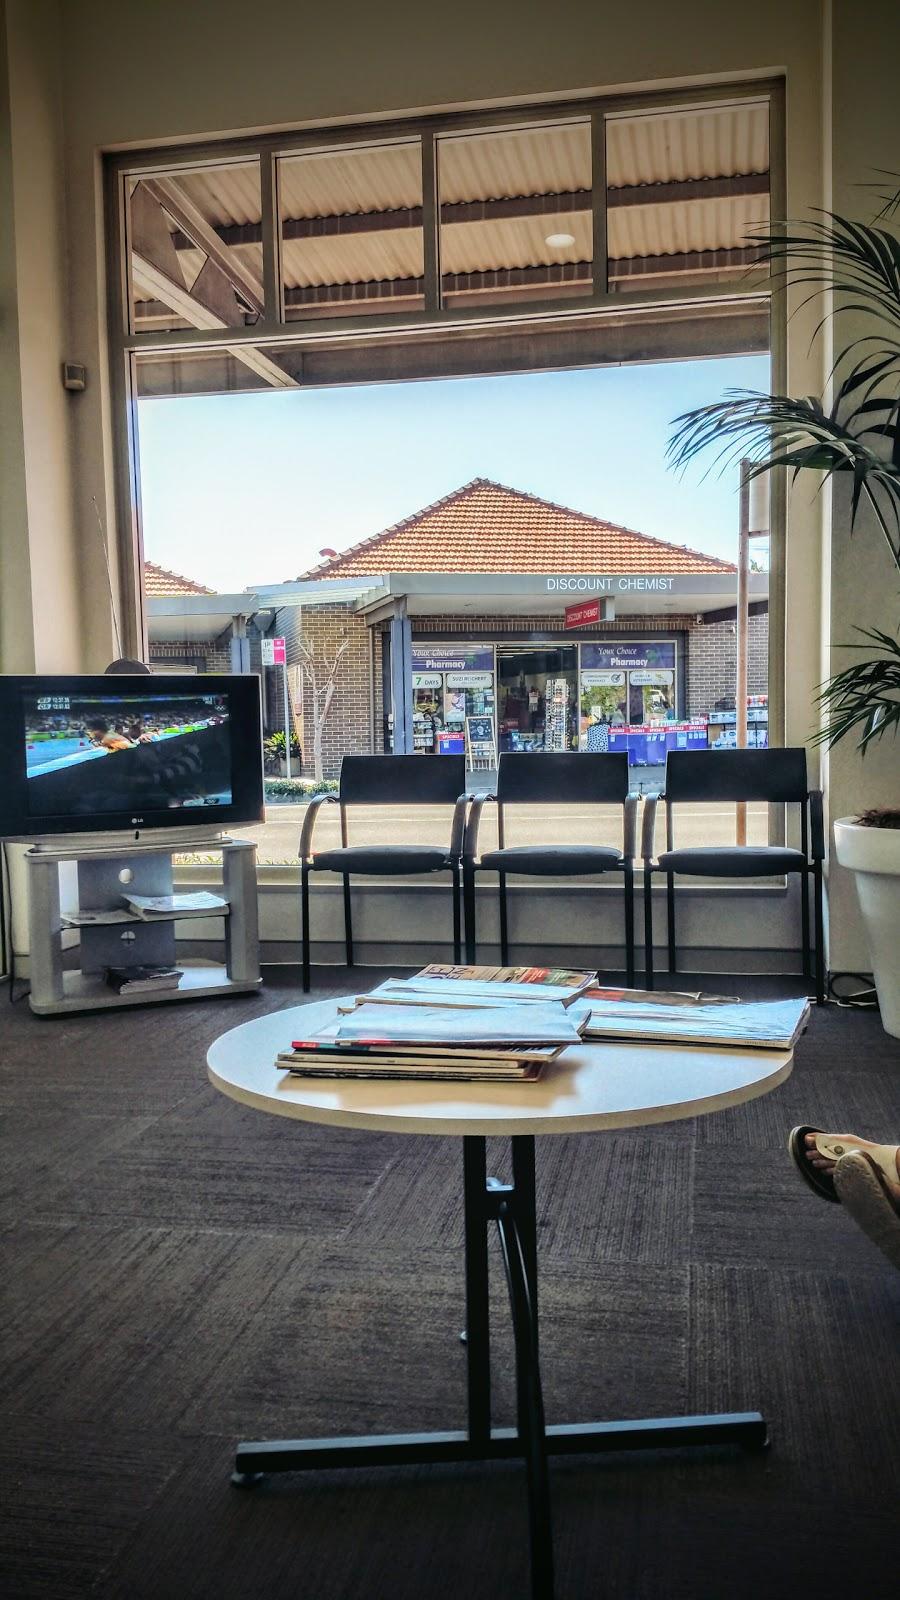 Ramsay Street Medical Centre | hospital | 112 Ramsay St, Haberfield NSW 2045, Australia | 0297995000 OR +61 2 9799 5000